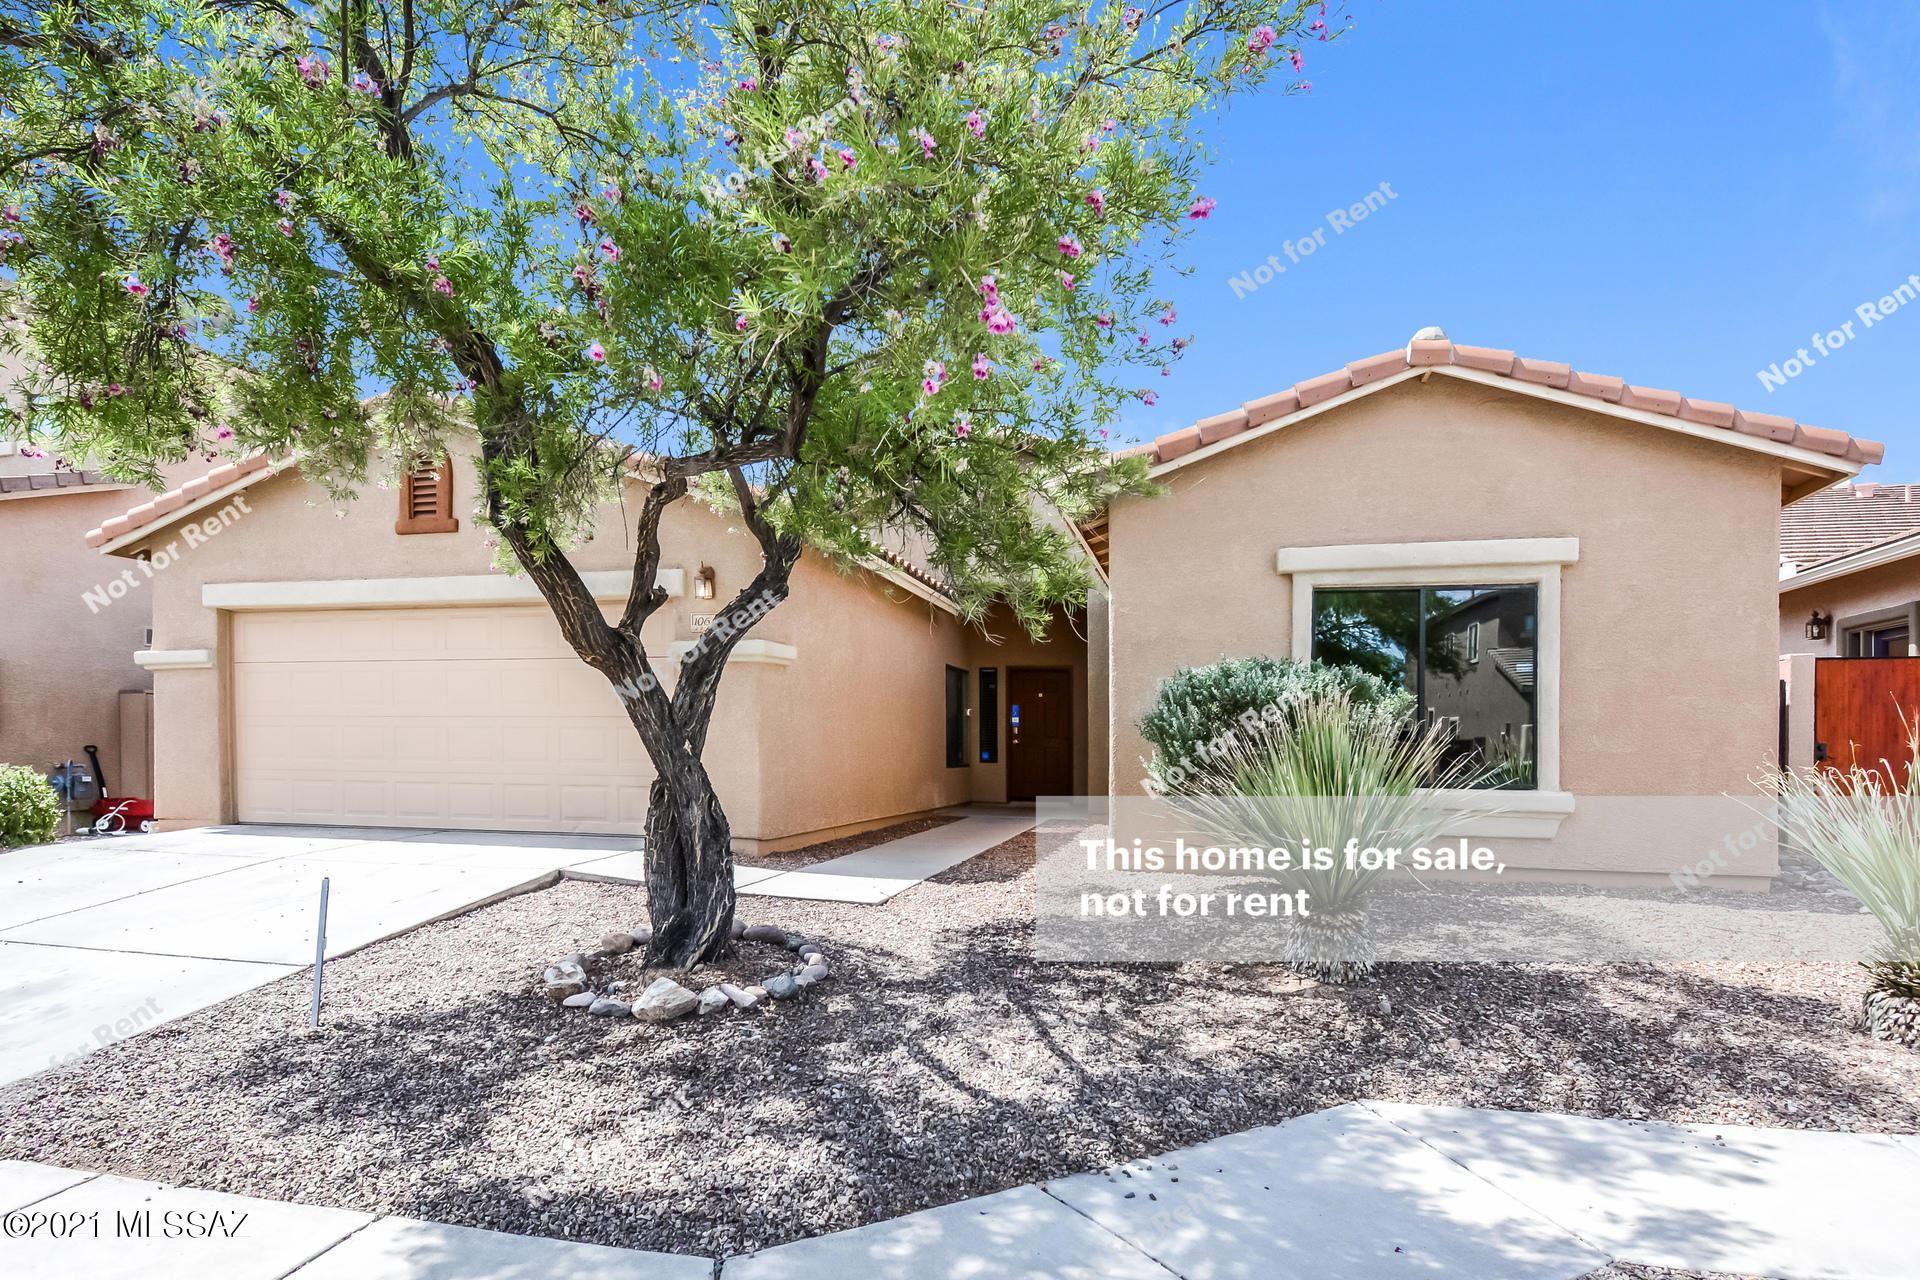 10642 E Ravenswood Street, Tucson, AZ 85747 - MLS#: 22114942